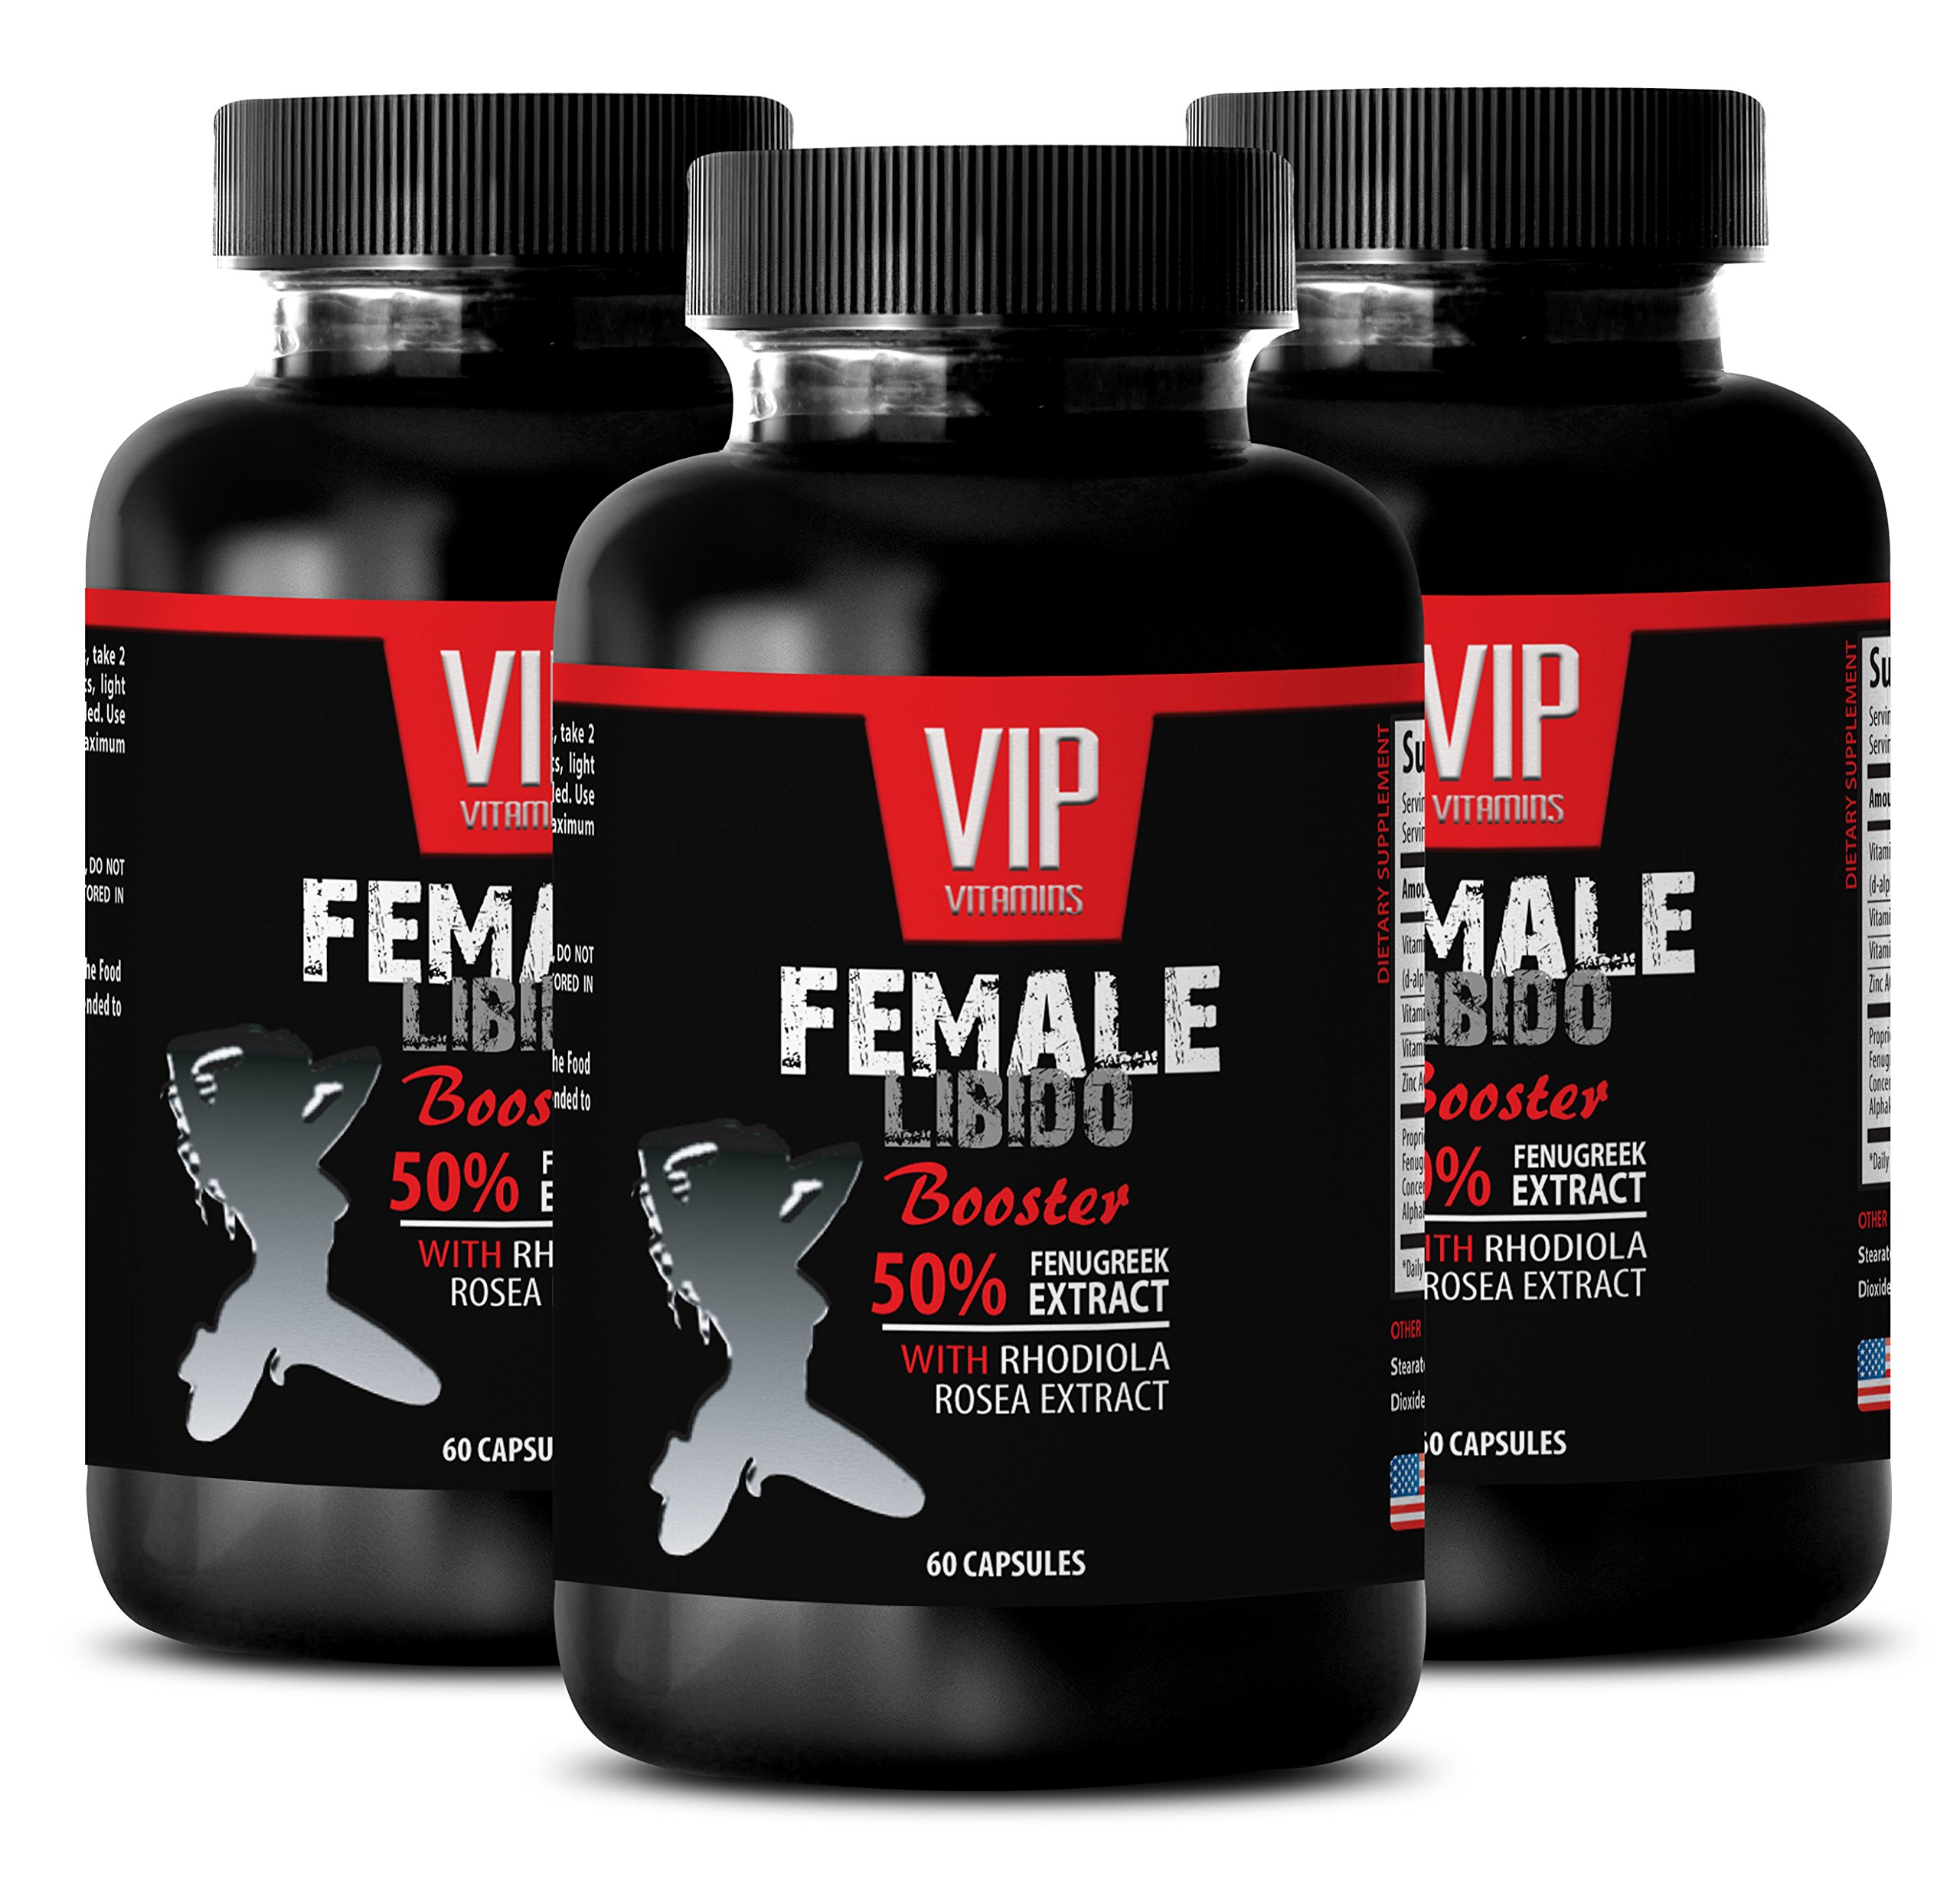 Boost Sex Drive for Women - Female LIBIDO Booster - Fenugreek 180 Capsules - 3 Bottles 180 Capsules